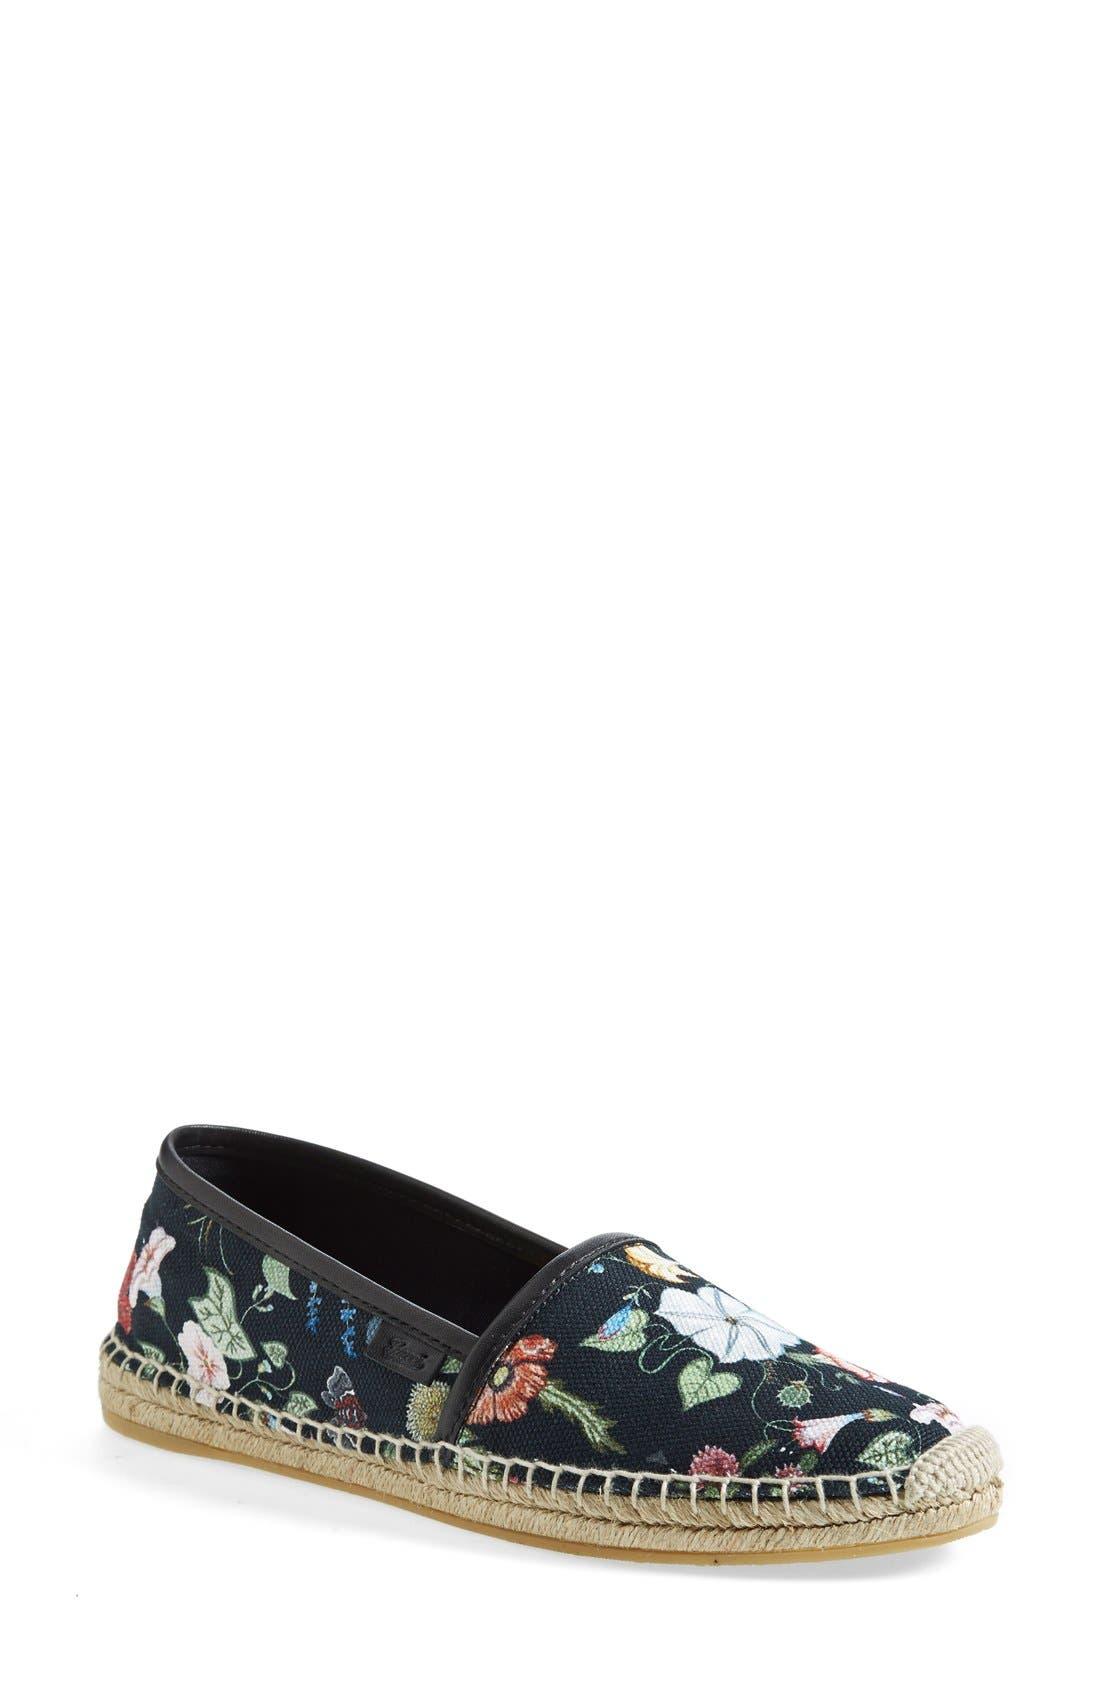 Main Image - Gucci 'Pilar' Floral Print Espadrille Flat